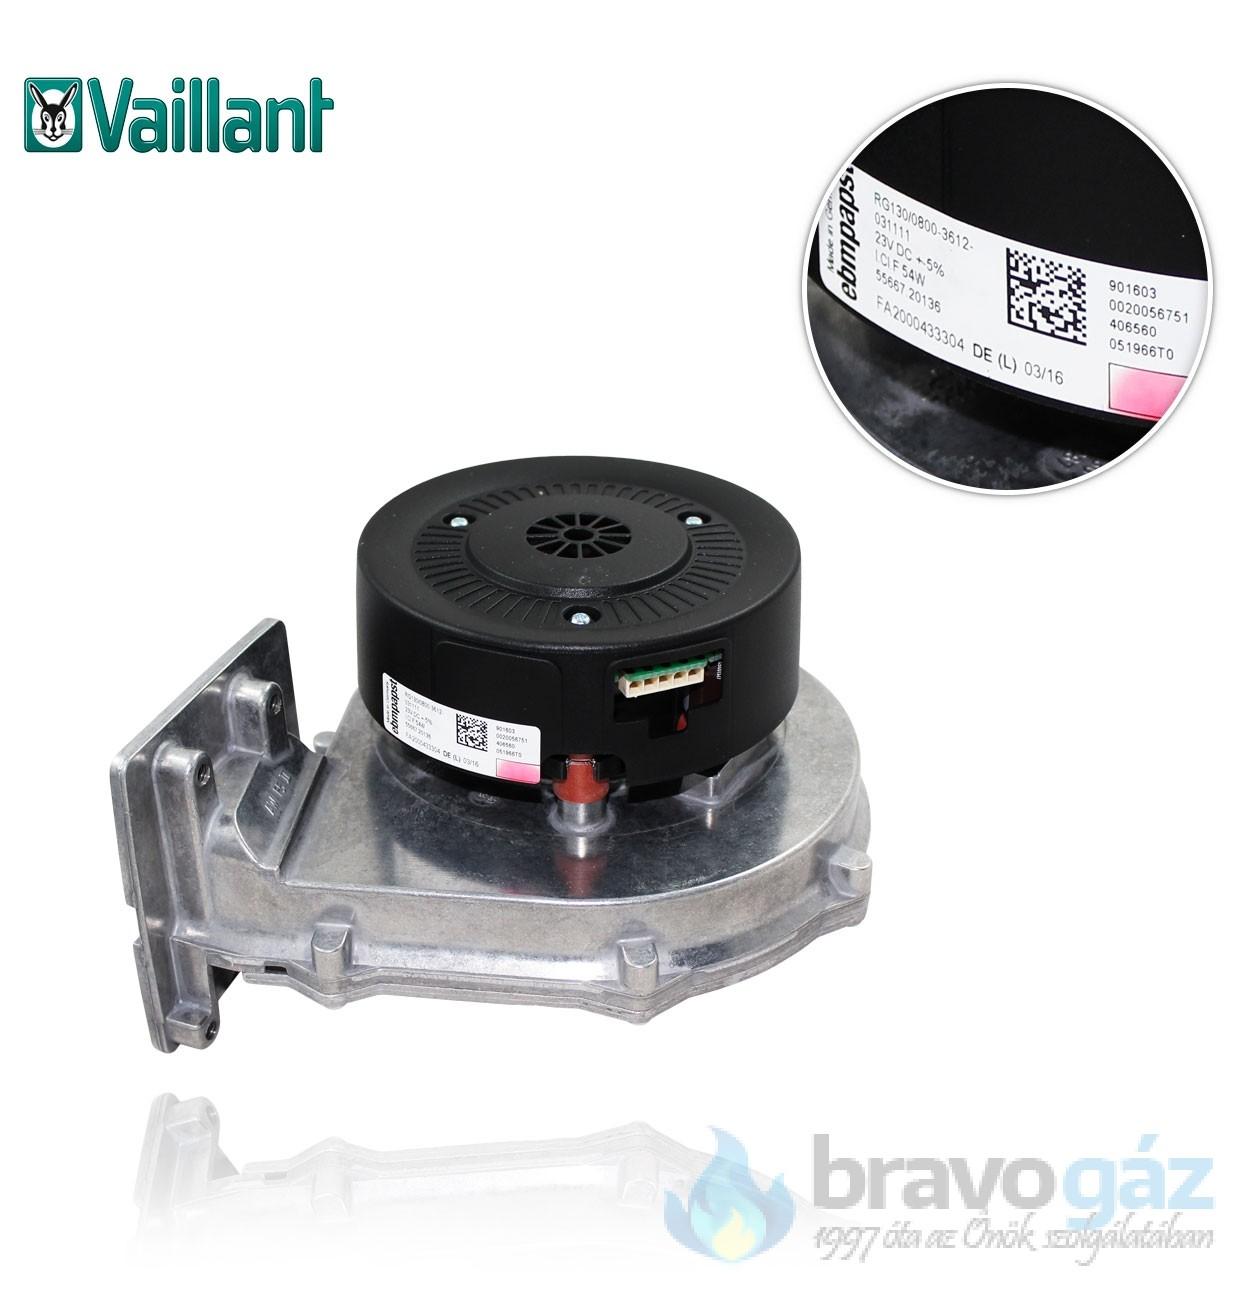 Vaillant ventilátor /3, VSC/2 193593